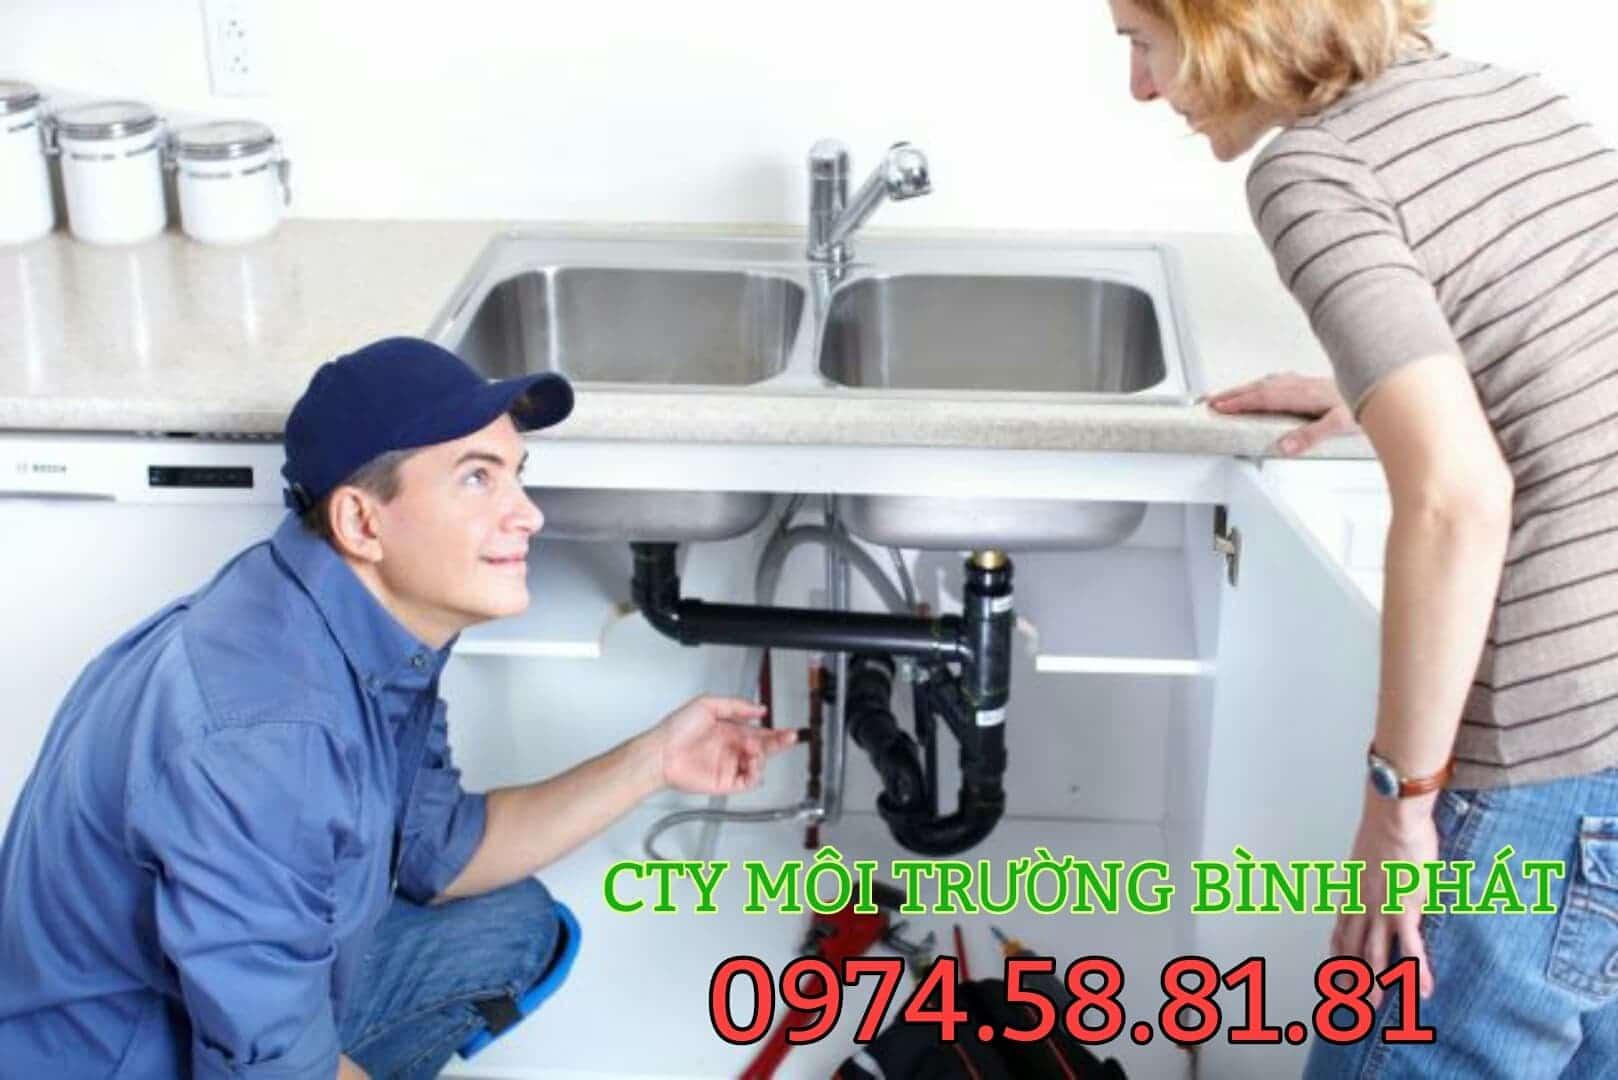 sửa chữa bồn rửa chén